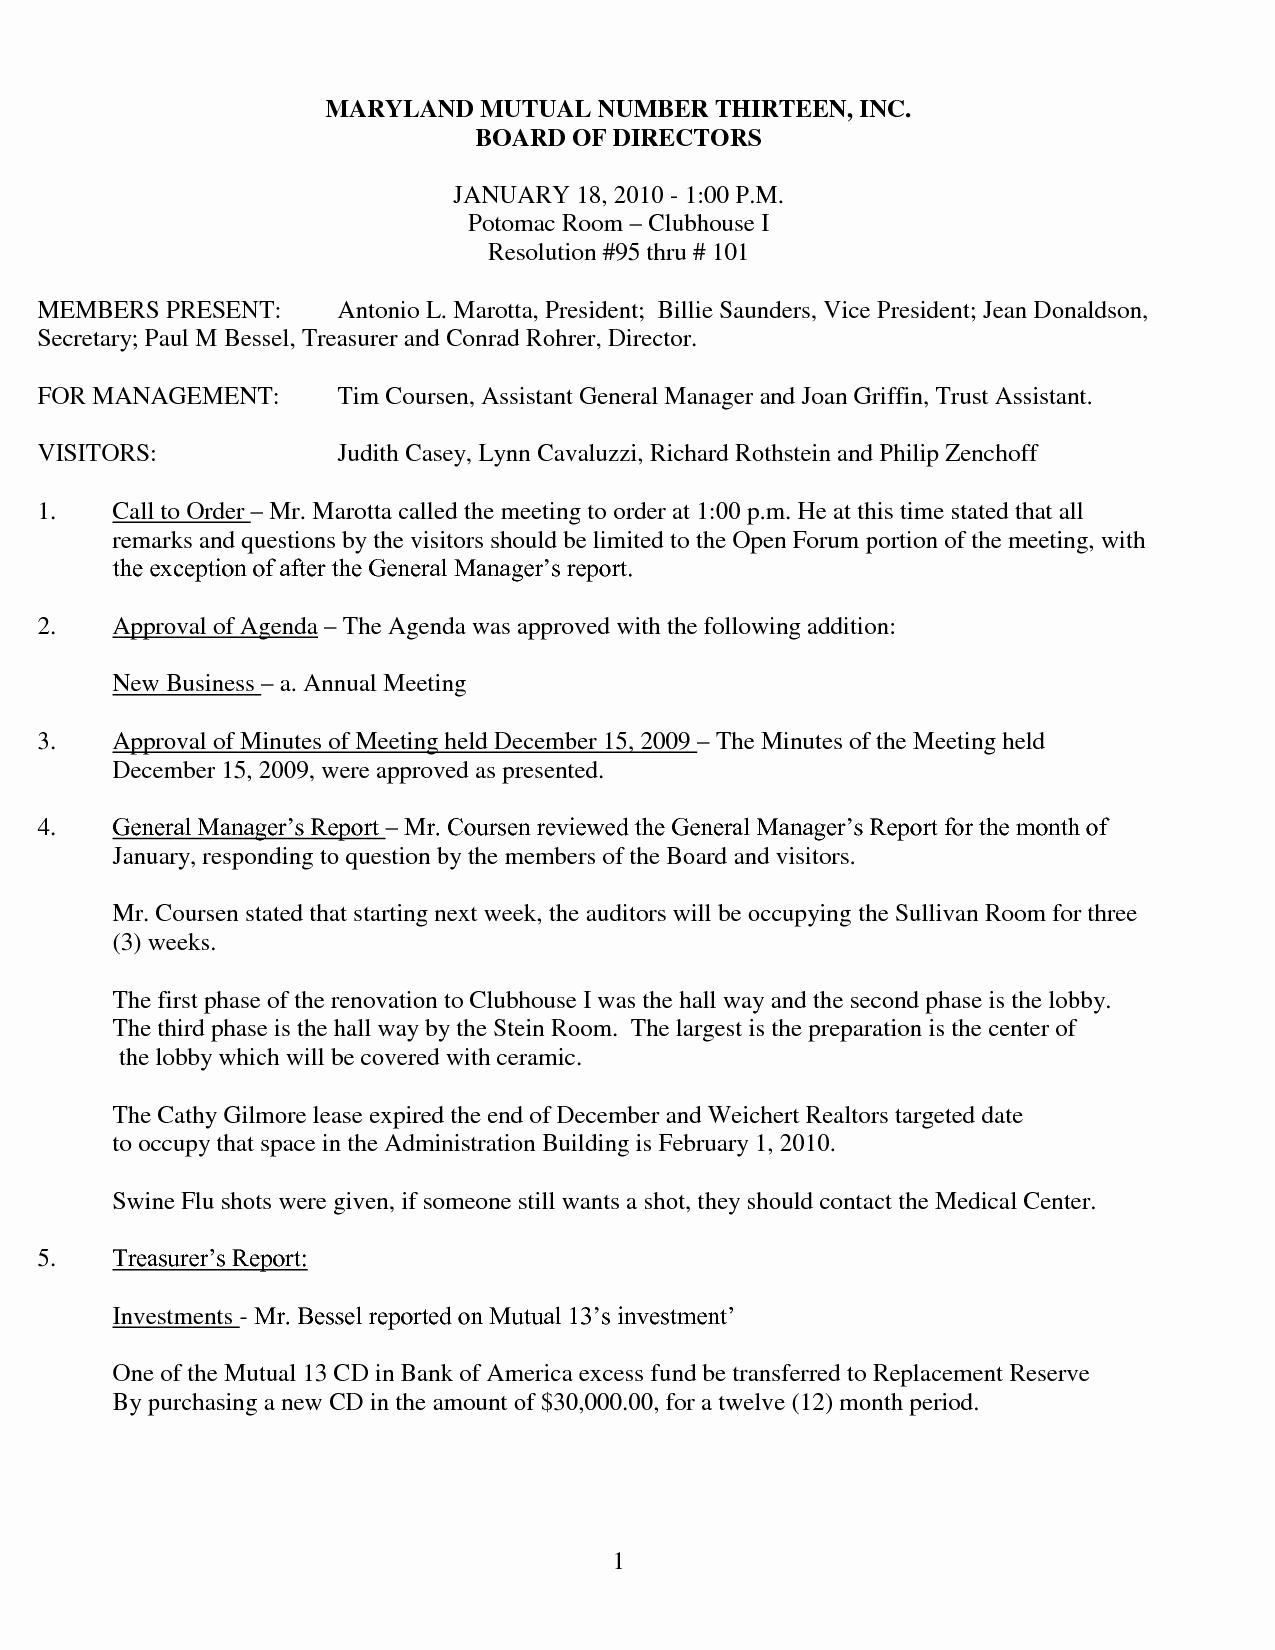 speeding ticket appeal letter template Collection-speeding ticket appeal letter template 13-d